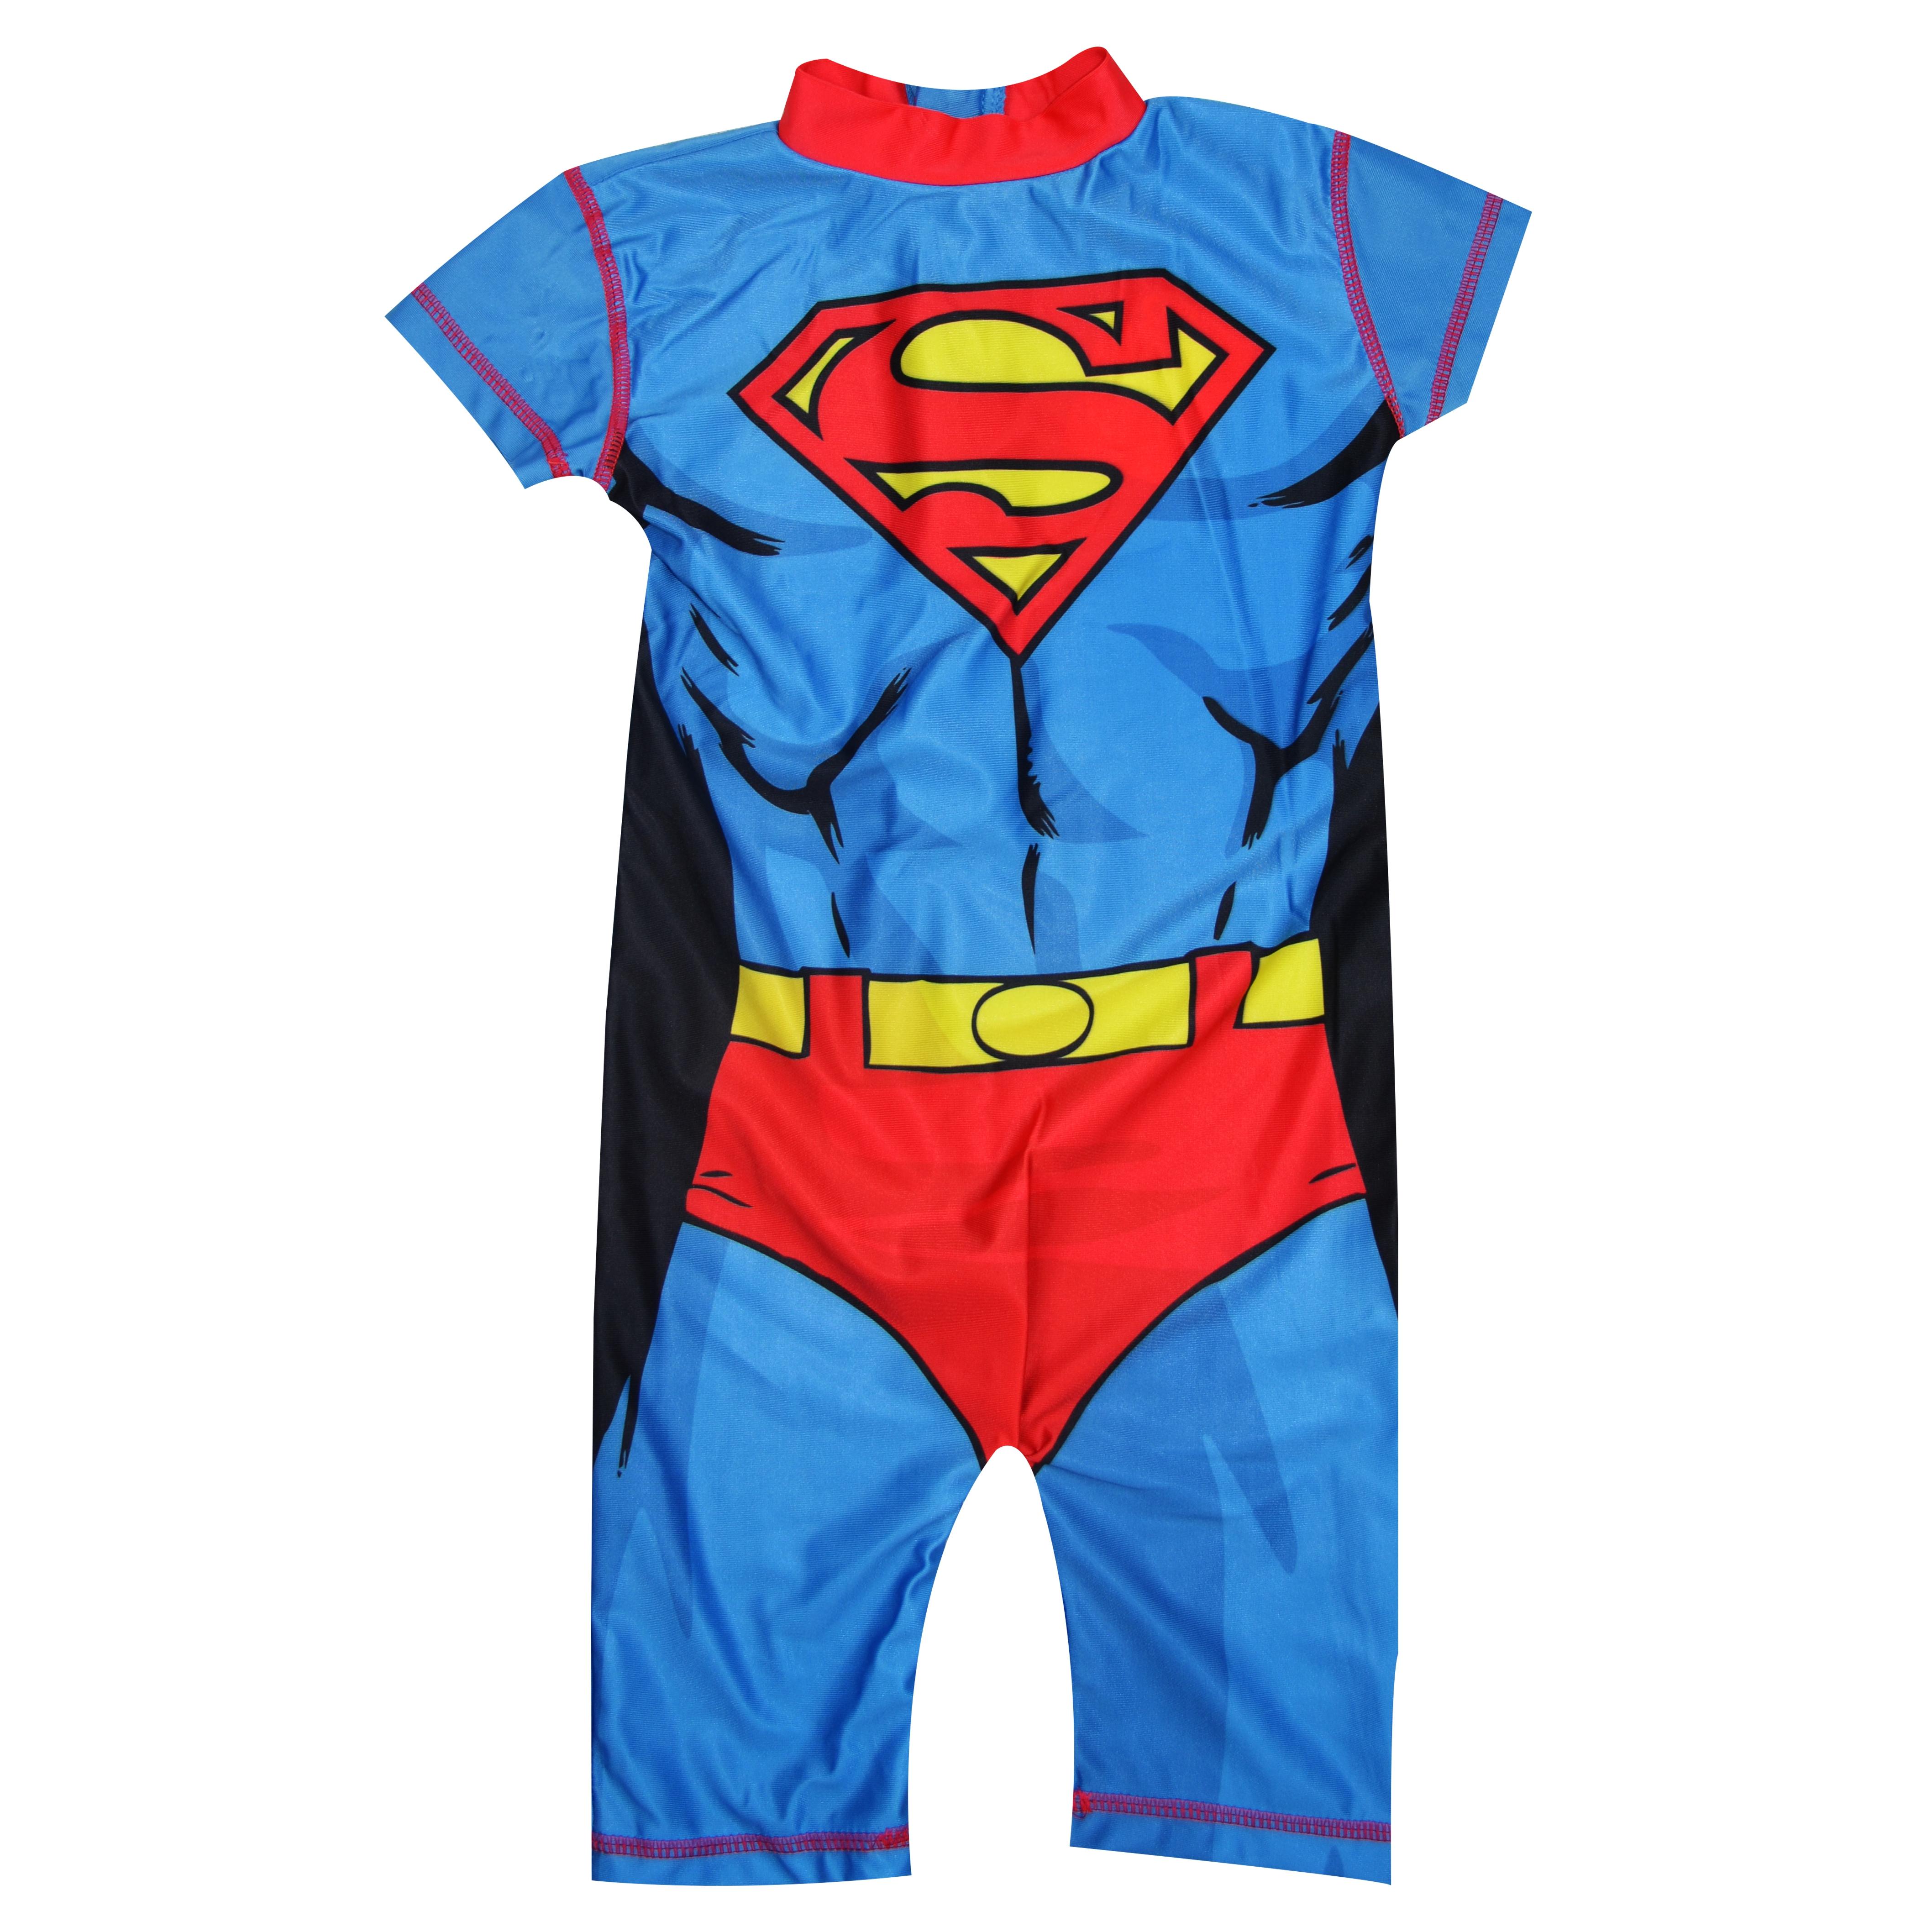 Superman 4-5 Years Swimsuit Swimming Pool